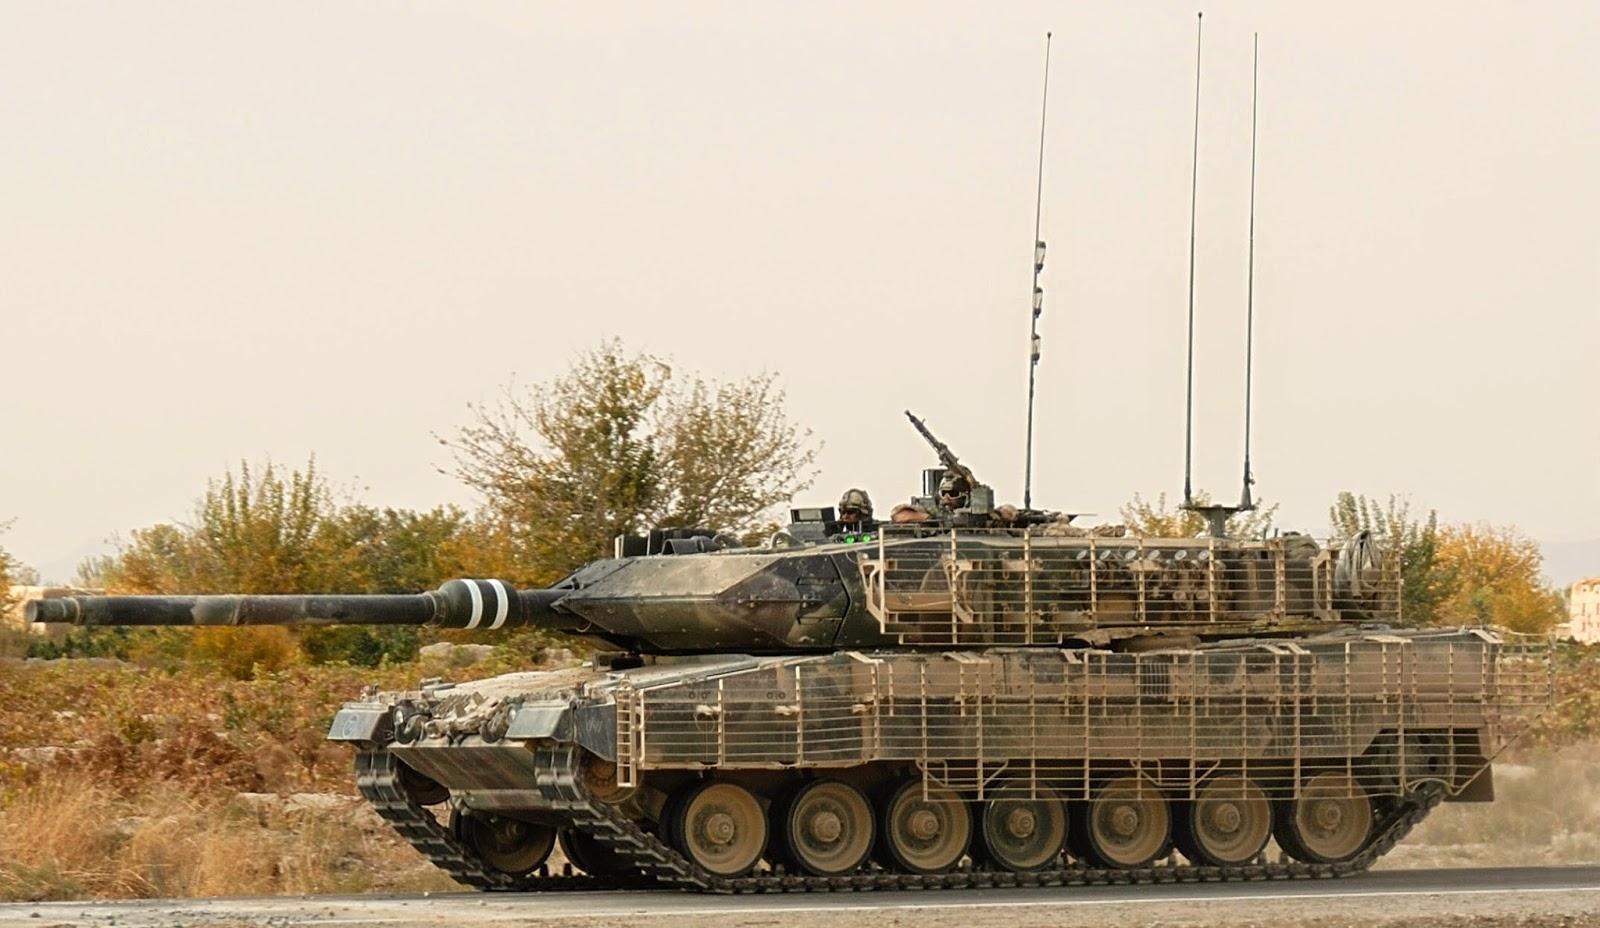 Carro de Combate Aleman Leopard